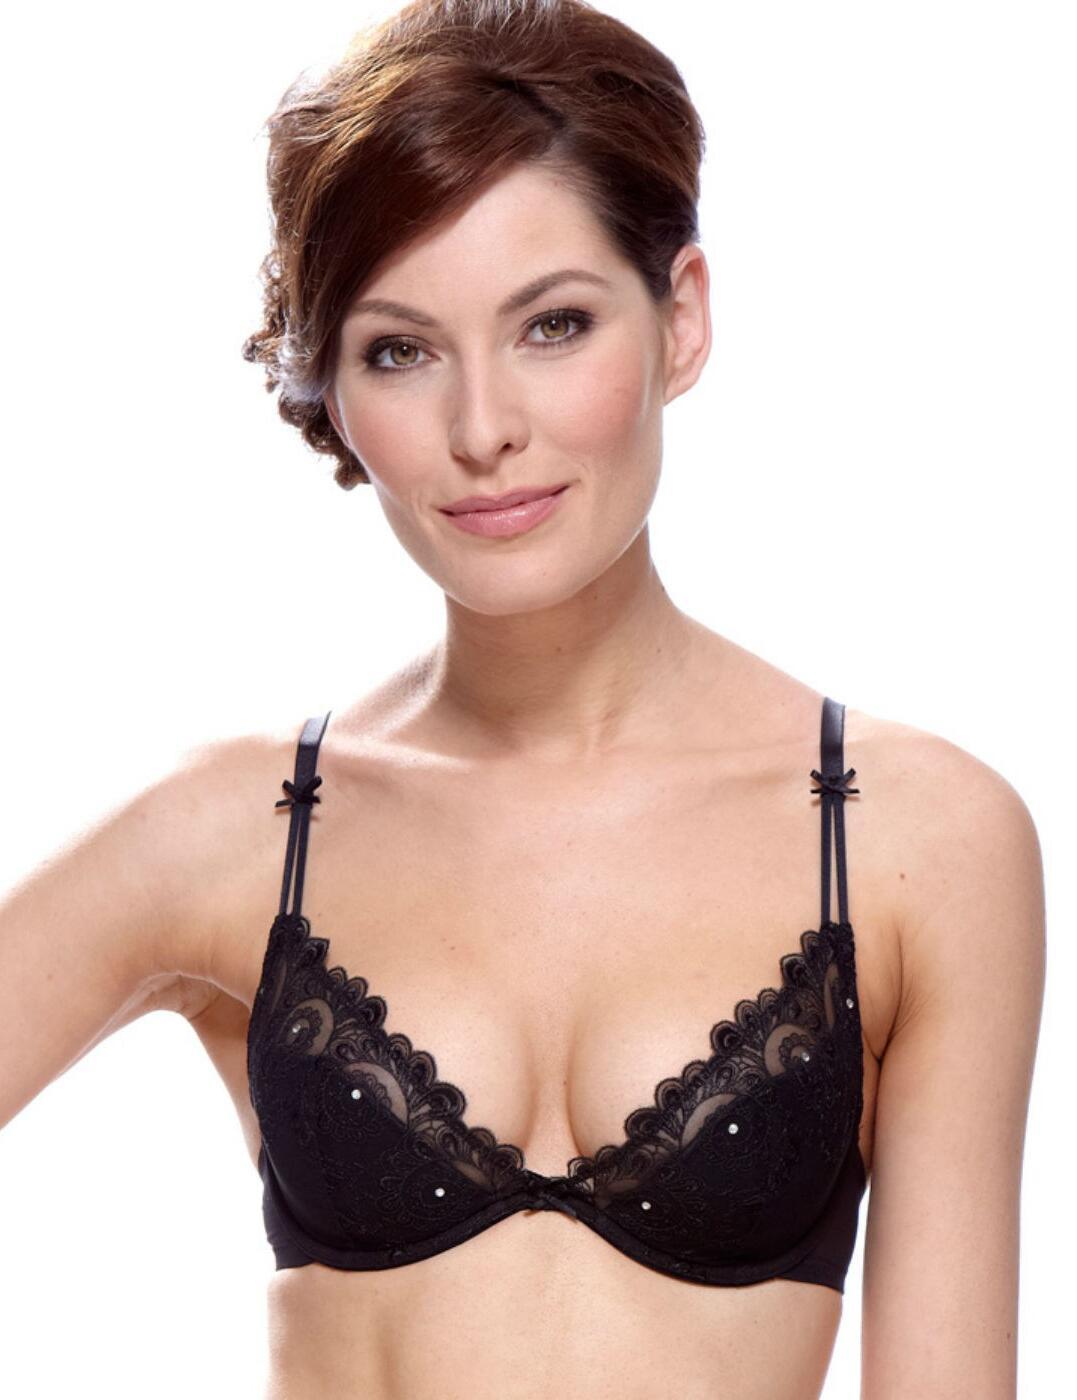 1207020 Lepel Erin Half Padded Plunge bra Black - 1207020 Plunge Bra